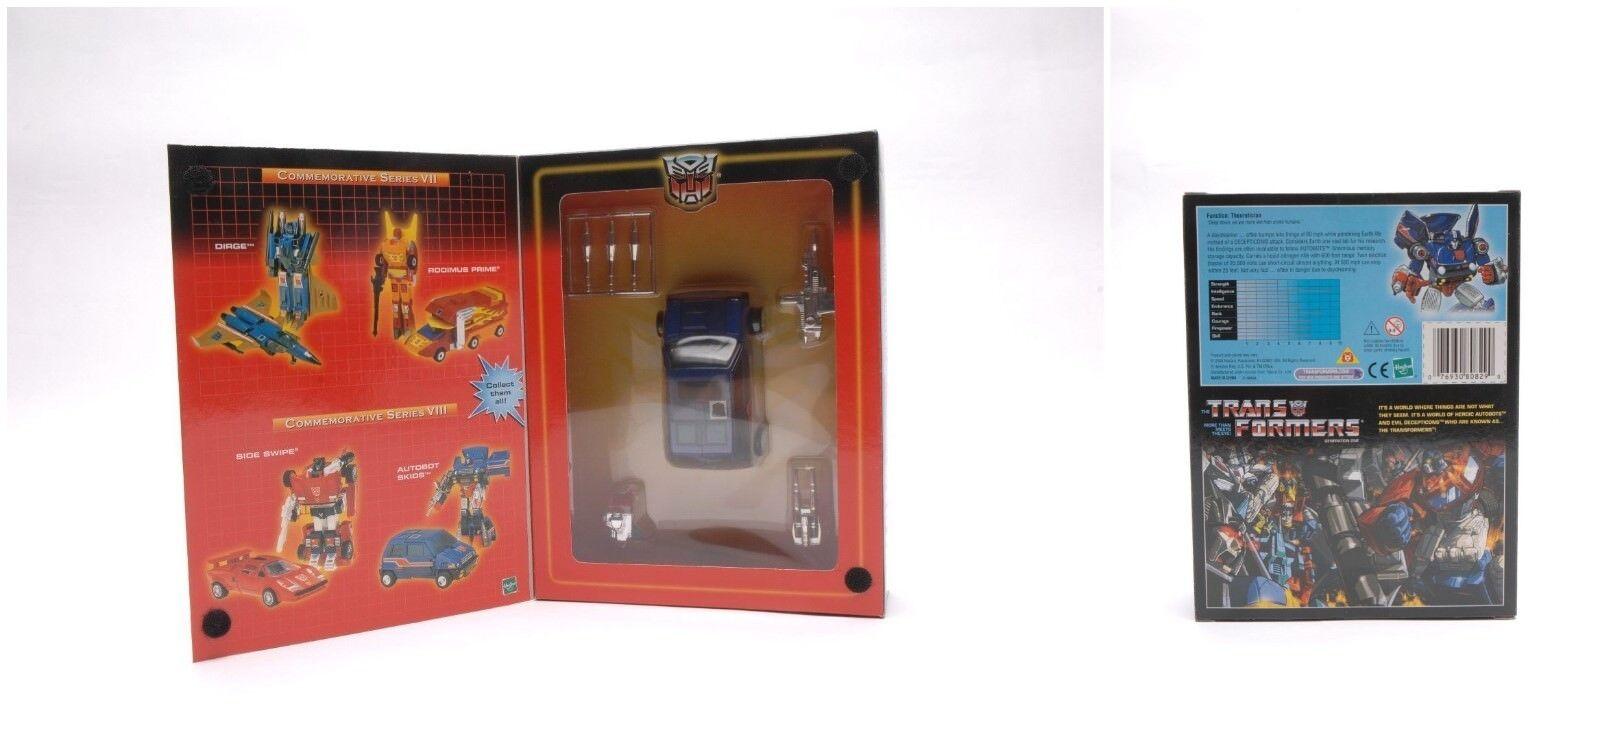 Transformers Autobot Skids MISB Hasbro G1 Reissue Christmas Gift